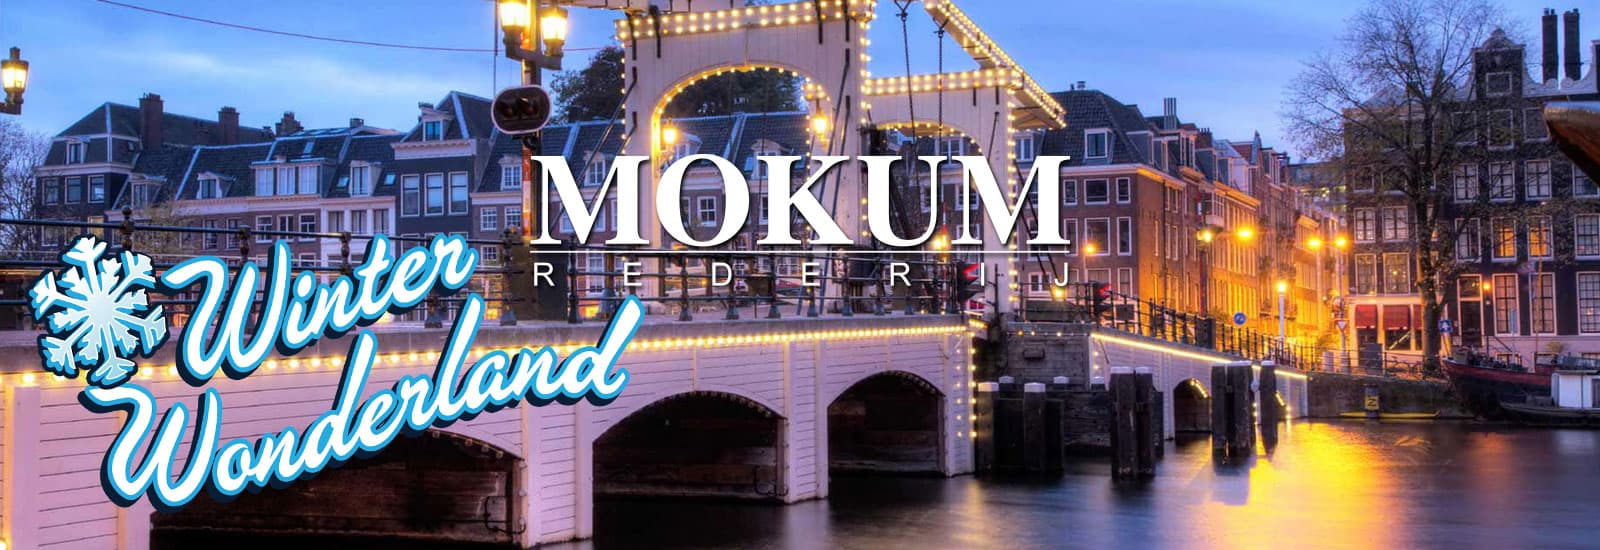 Winter Wonderland Amsterdam Rederij Mokum